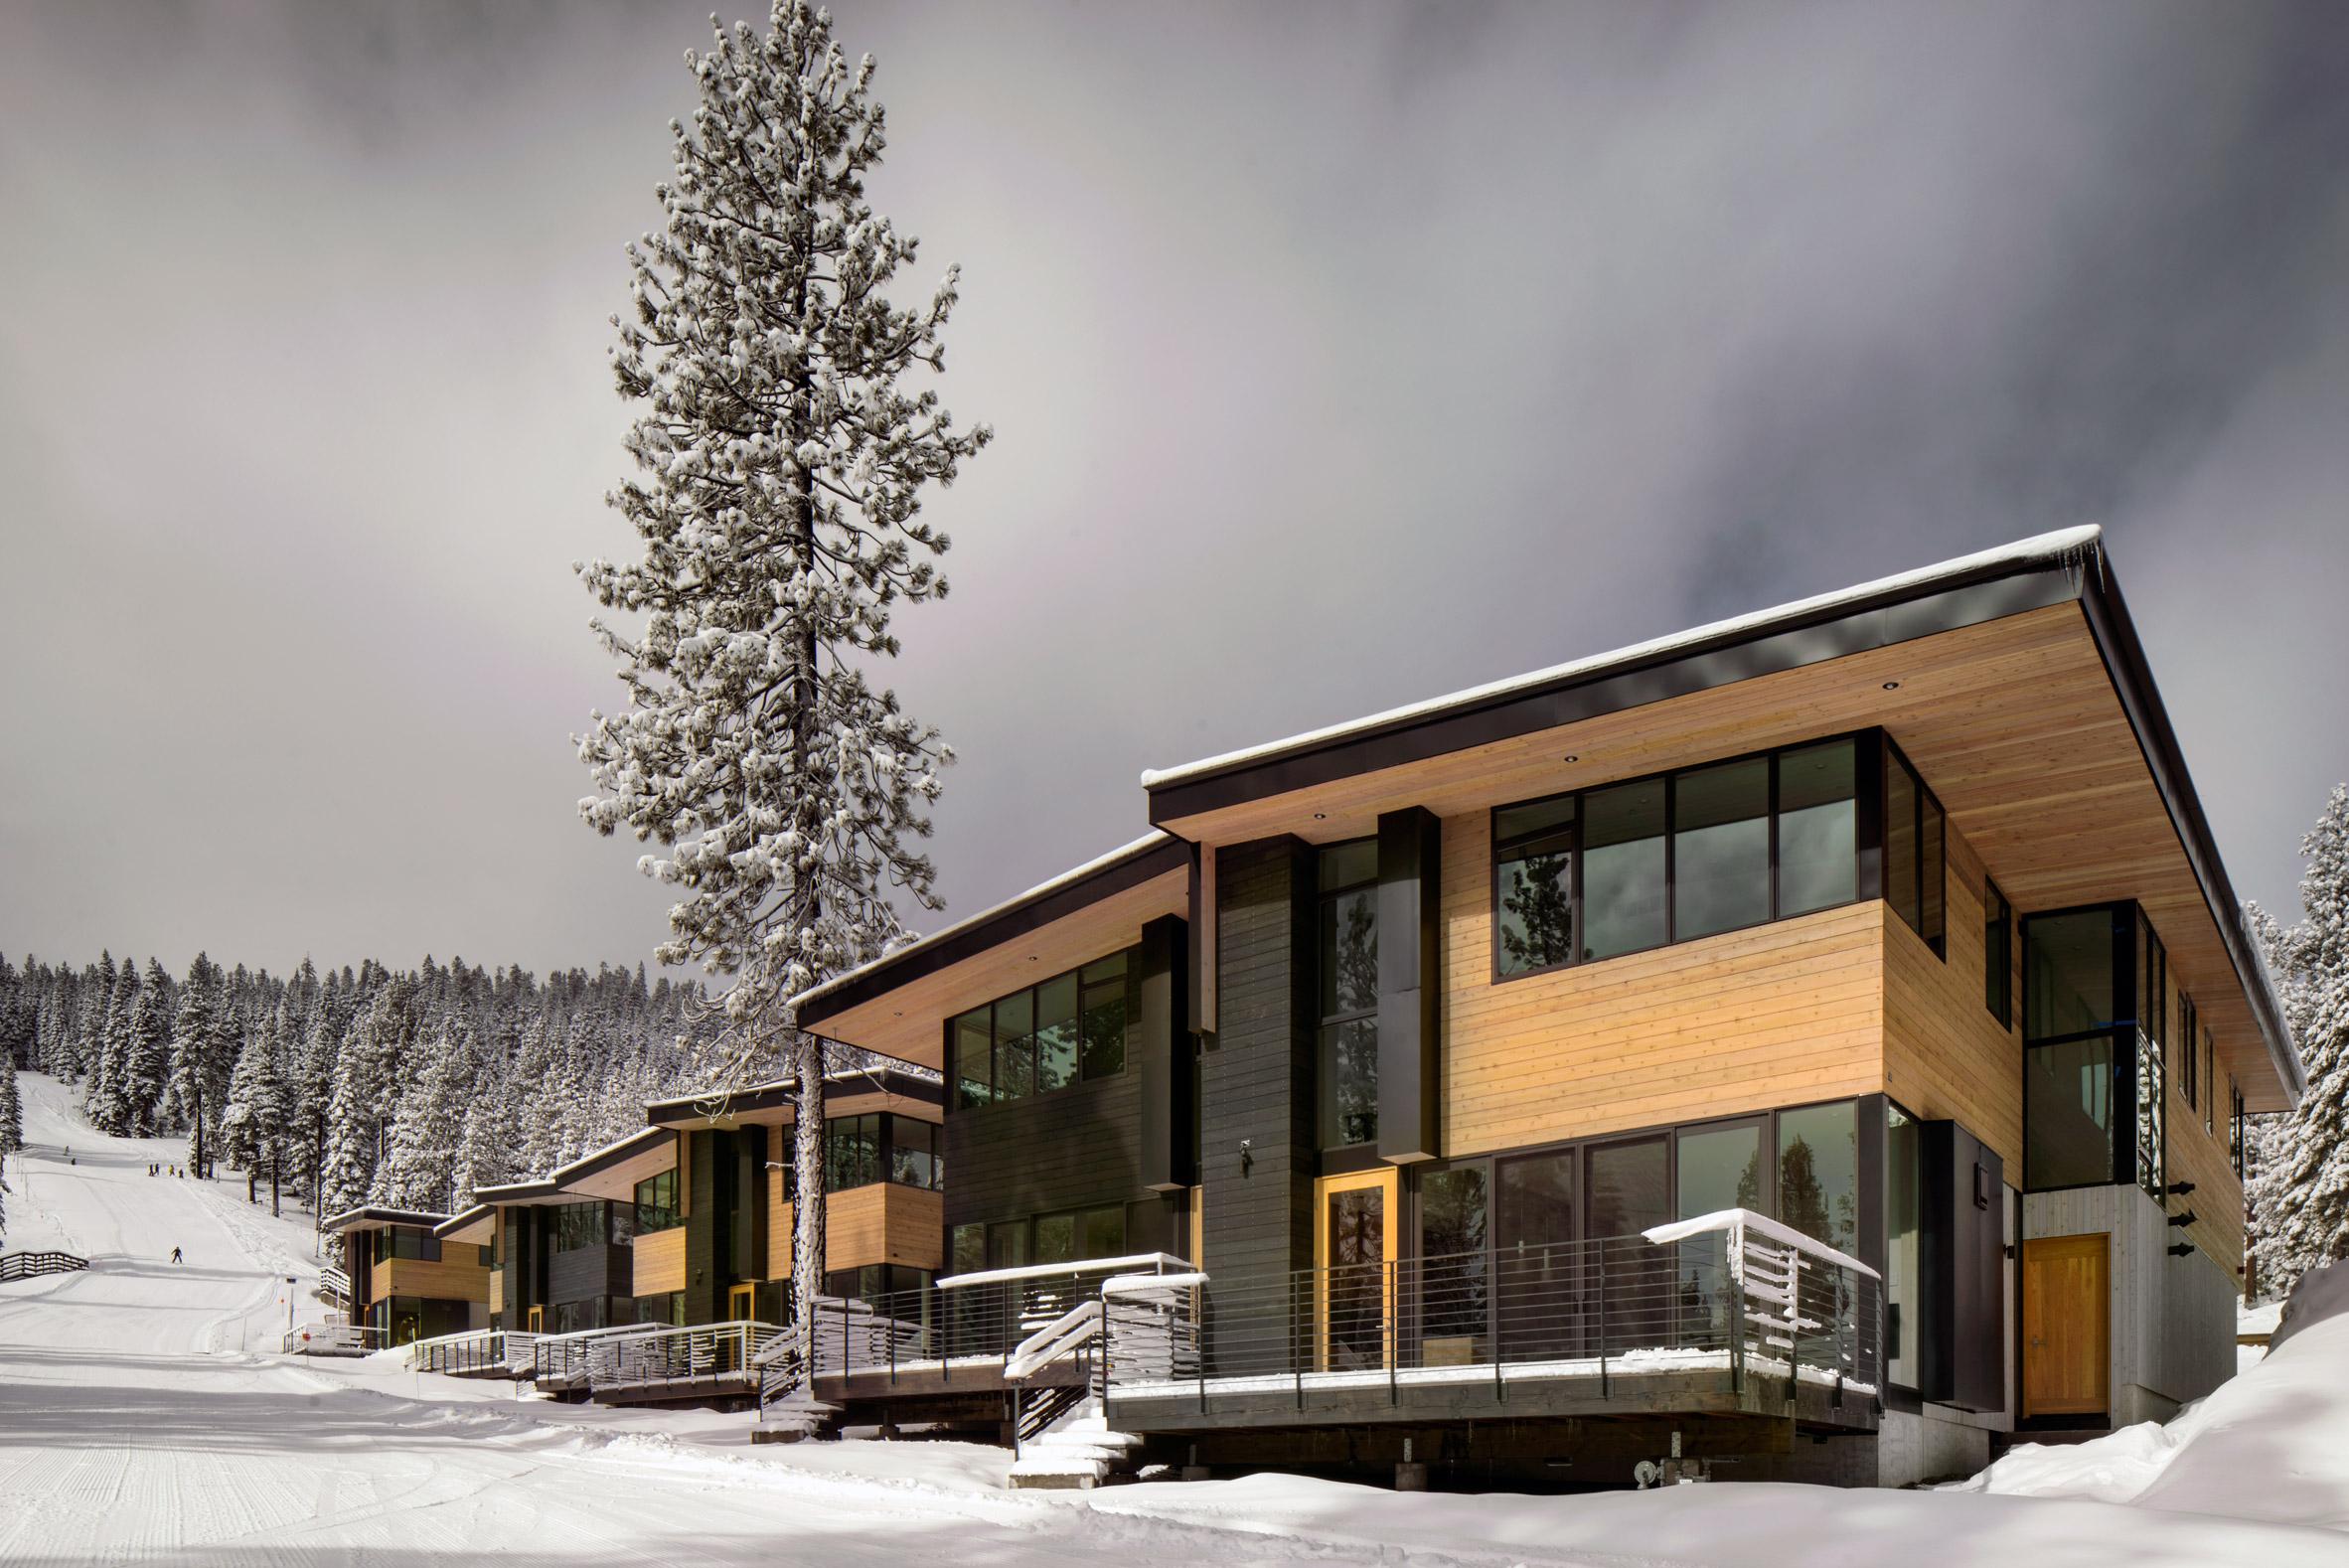 Bohlin Cywinski Jackson adds ski-in, ski-out homes to California mountain resort